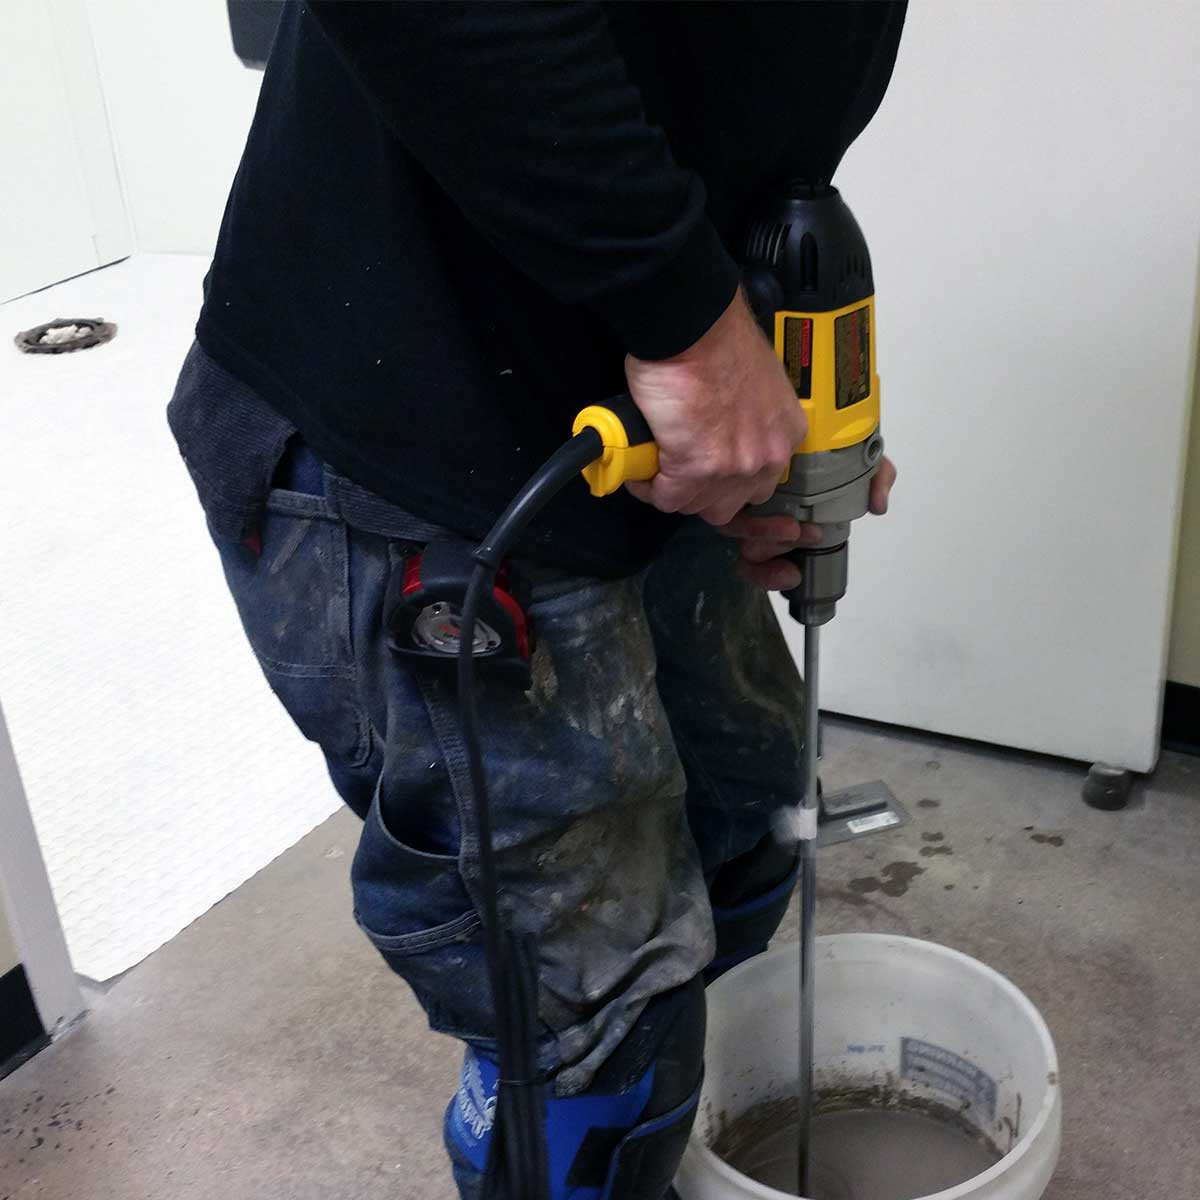 Dewalt DW130V mixing drill